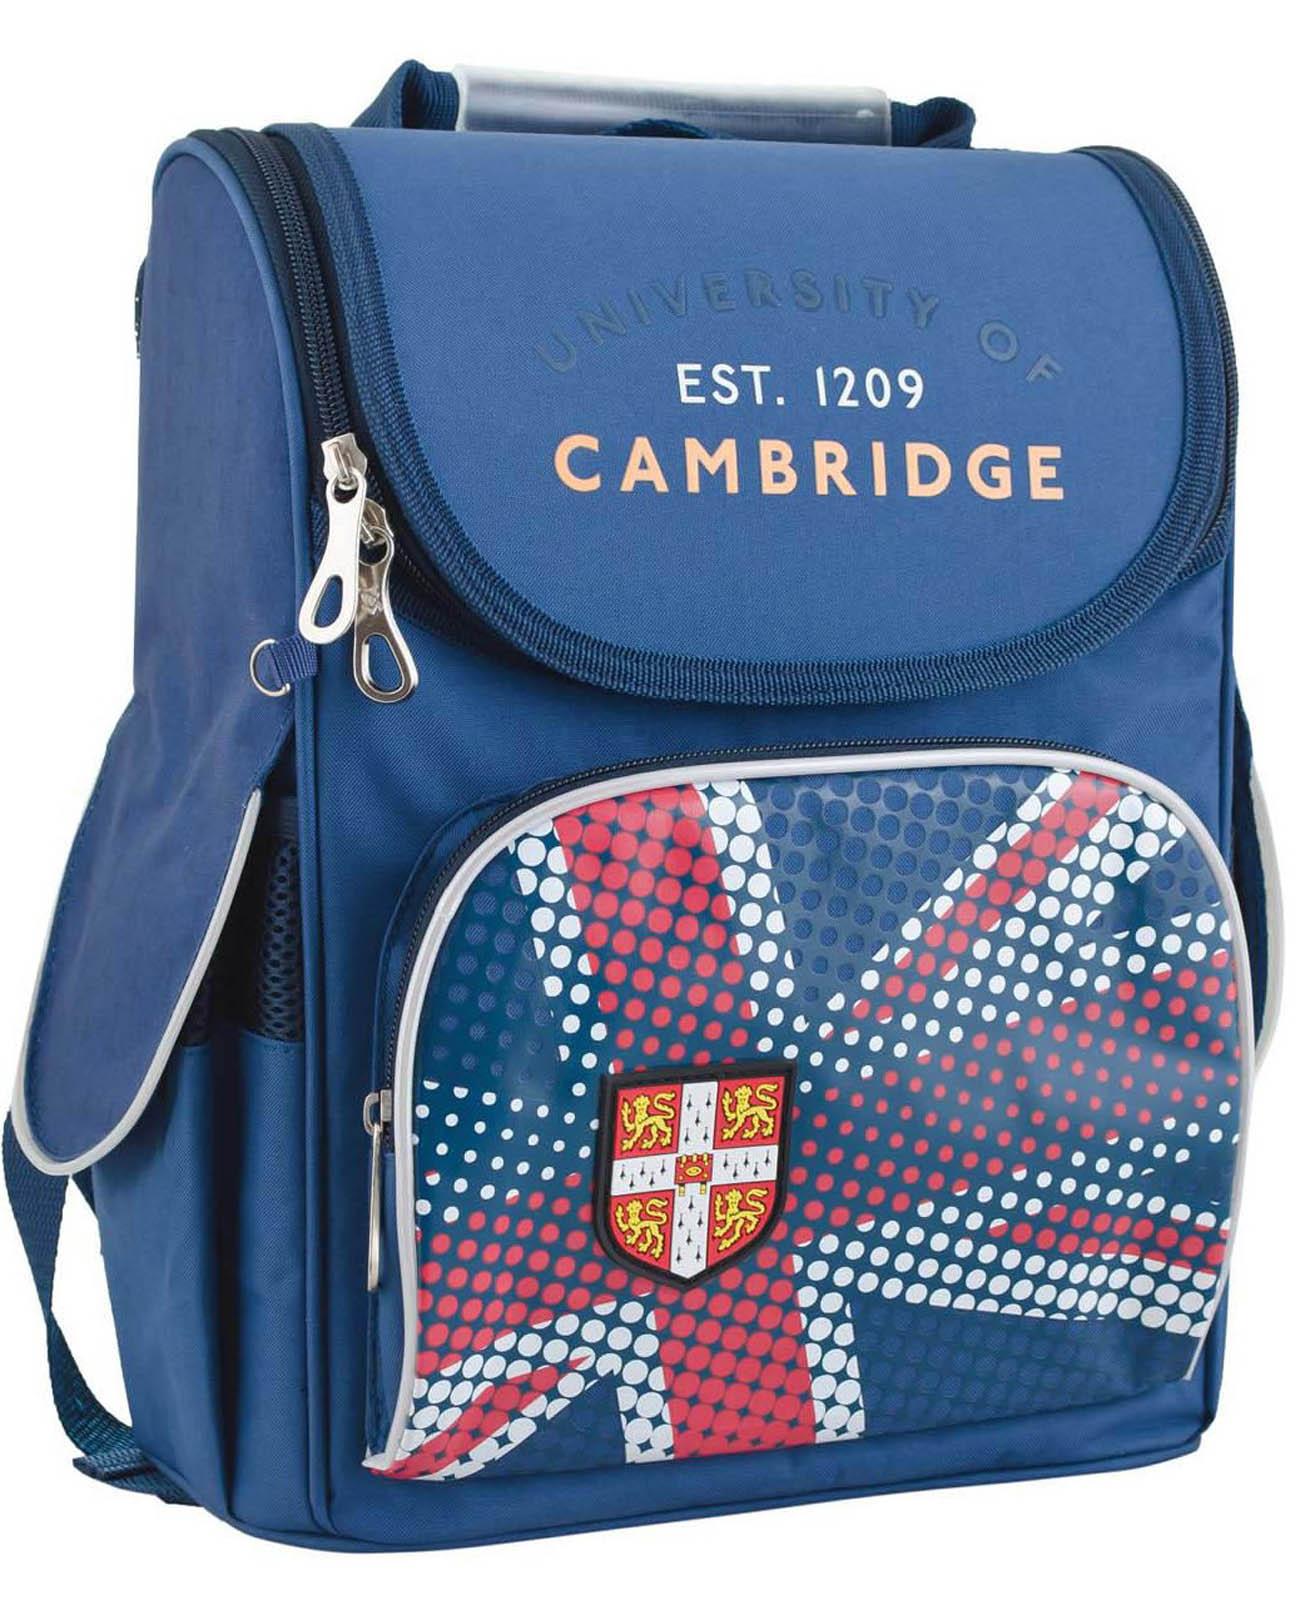 Рюкзак каркасный H-11 Cambridge blue, 34*26*14